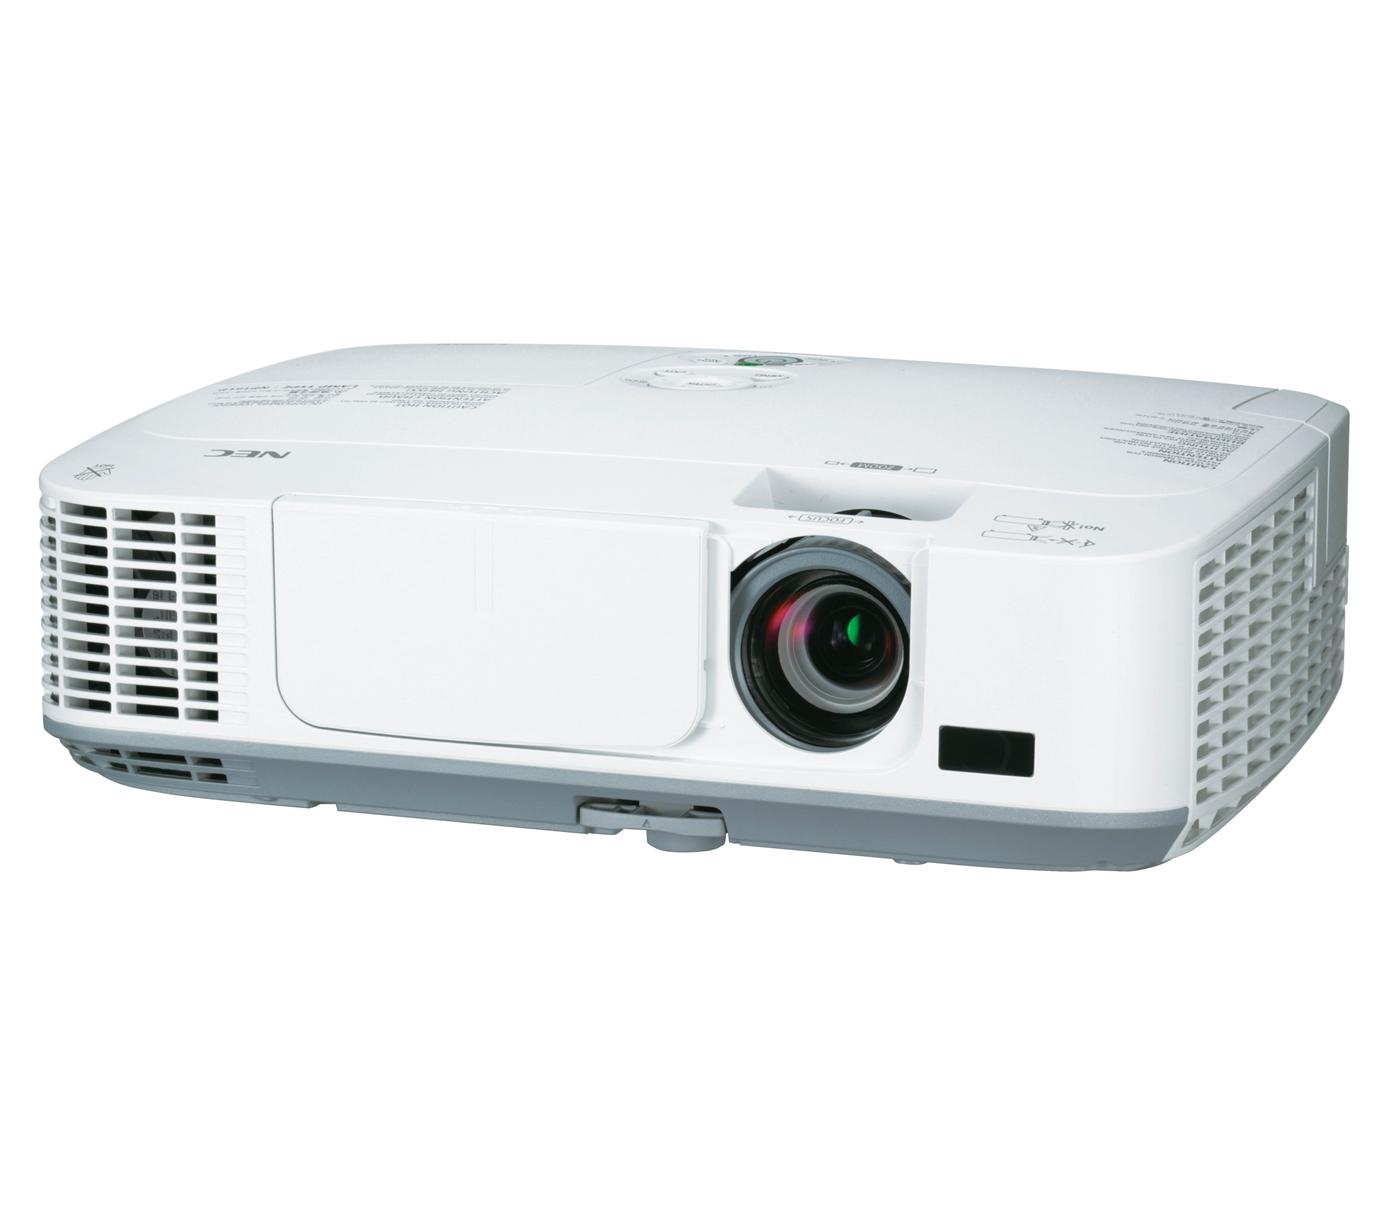 NEC LCD proj. M311W - 3100lm,WXGA,HDMI,LAN,USB